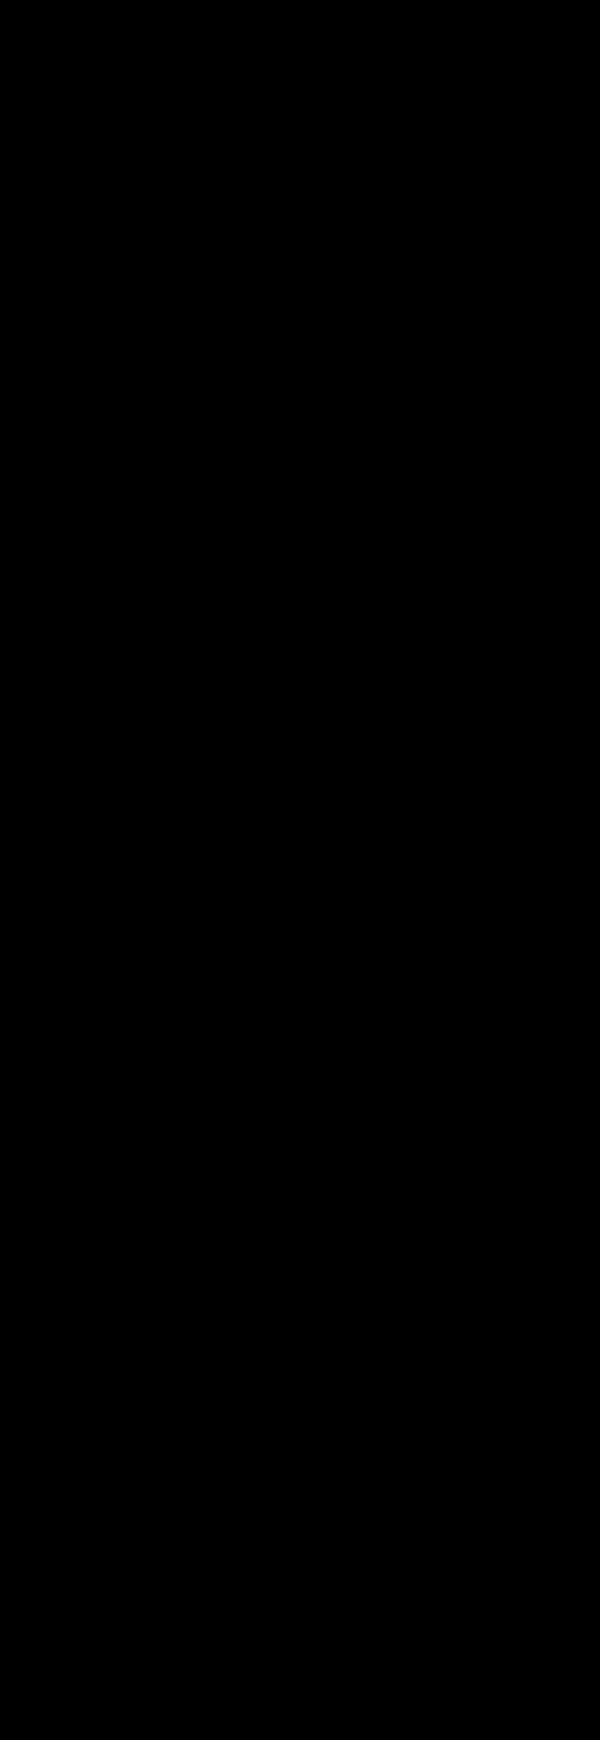 600x1740 Human Clipart Person Silhouette